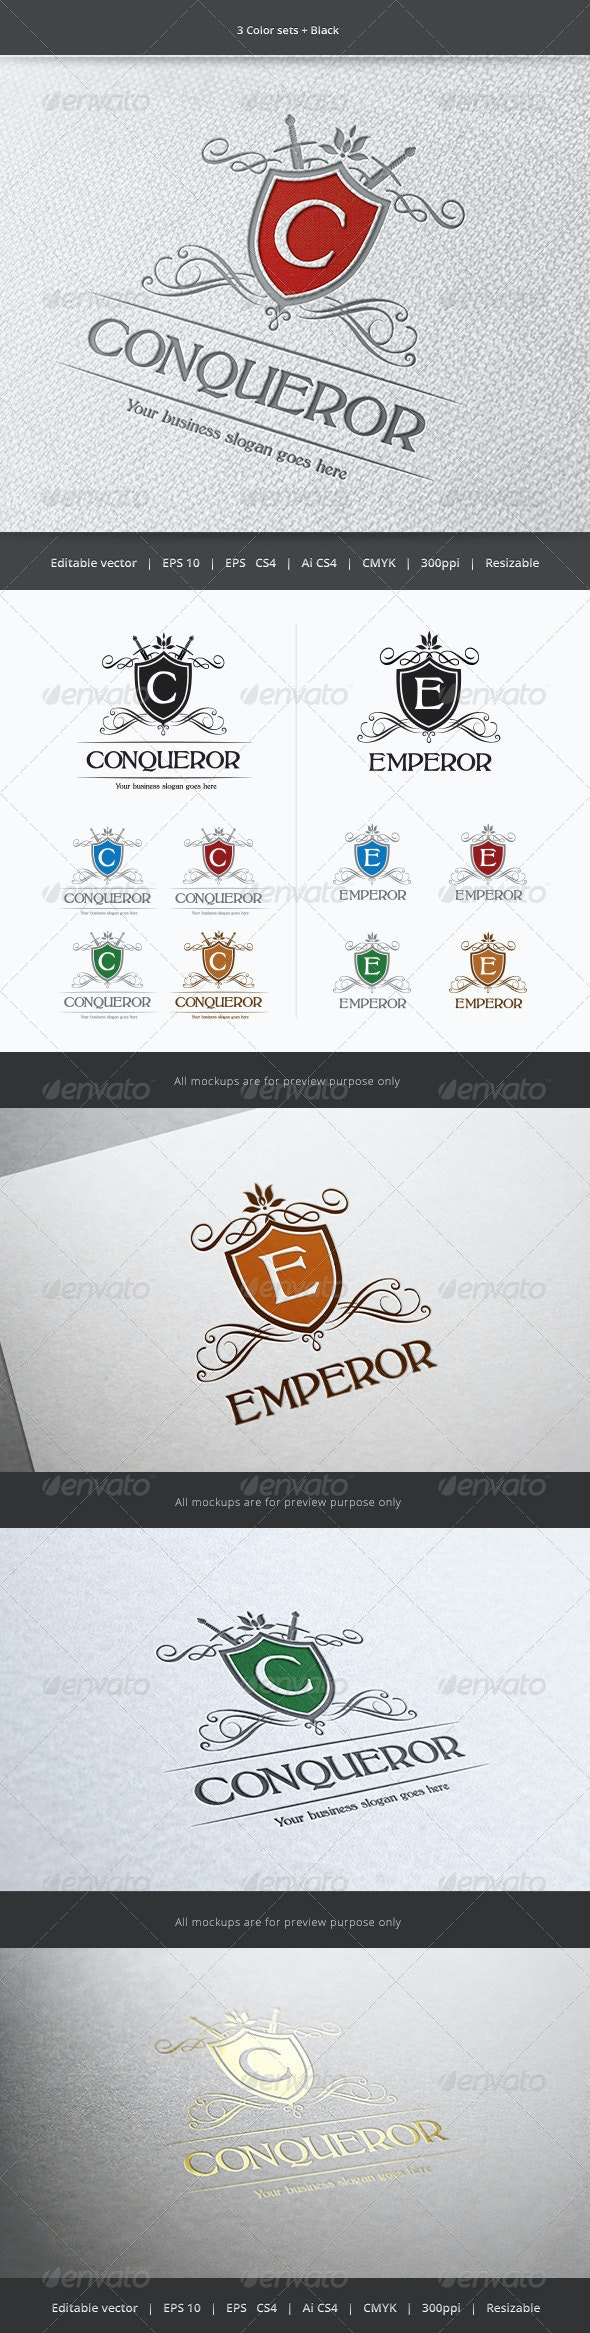 Conqueror Crest Logo - Crests Logo Templates